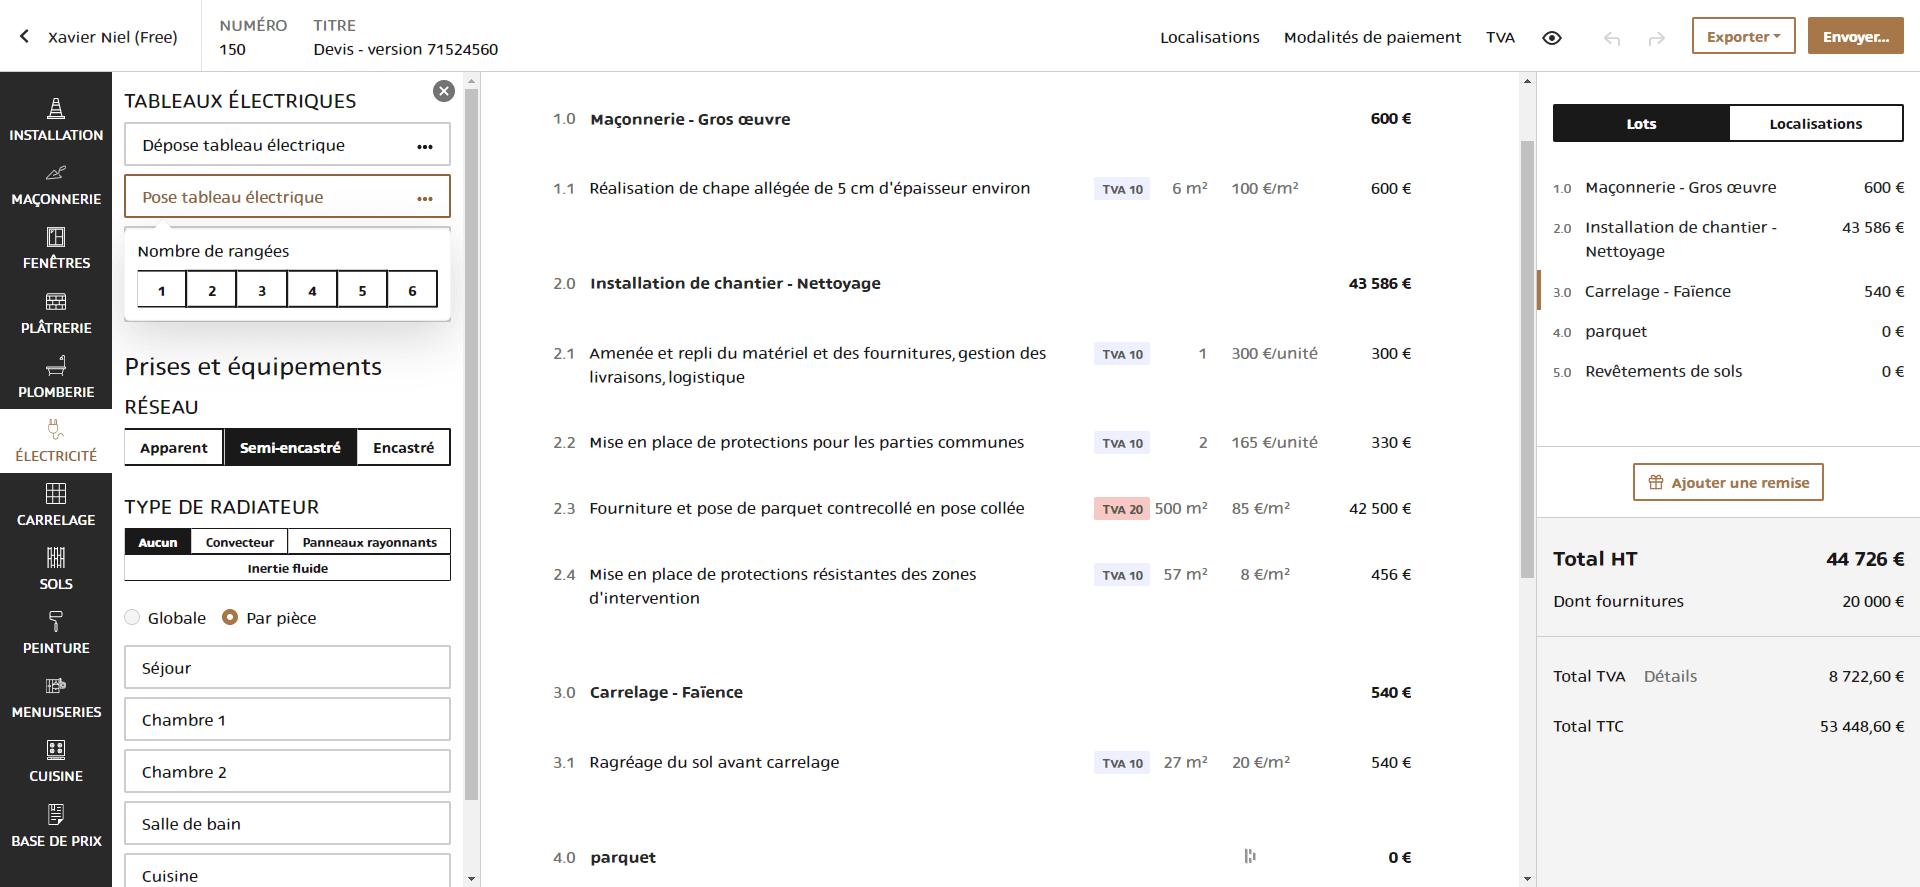 CRM logiciel devis base prix hemea